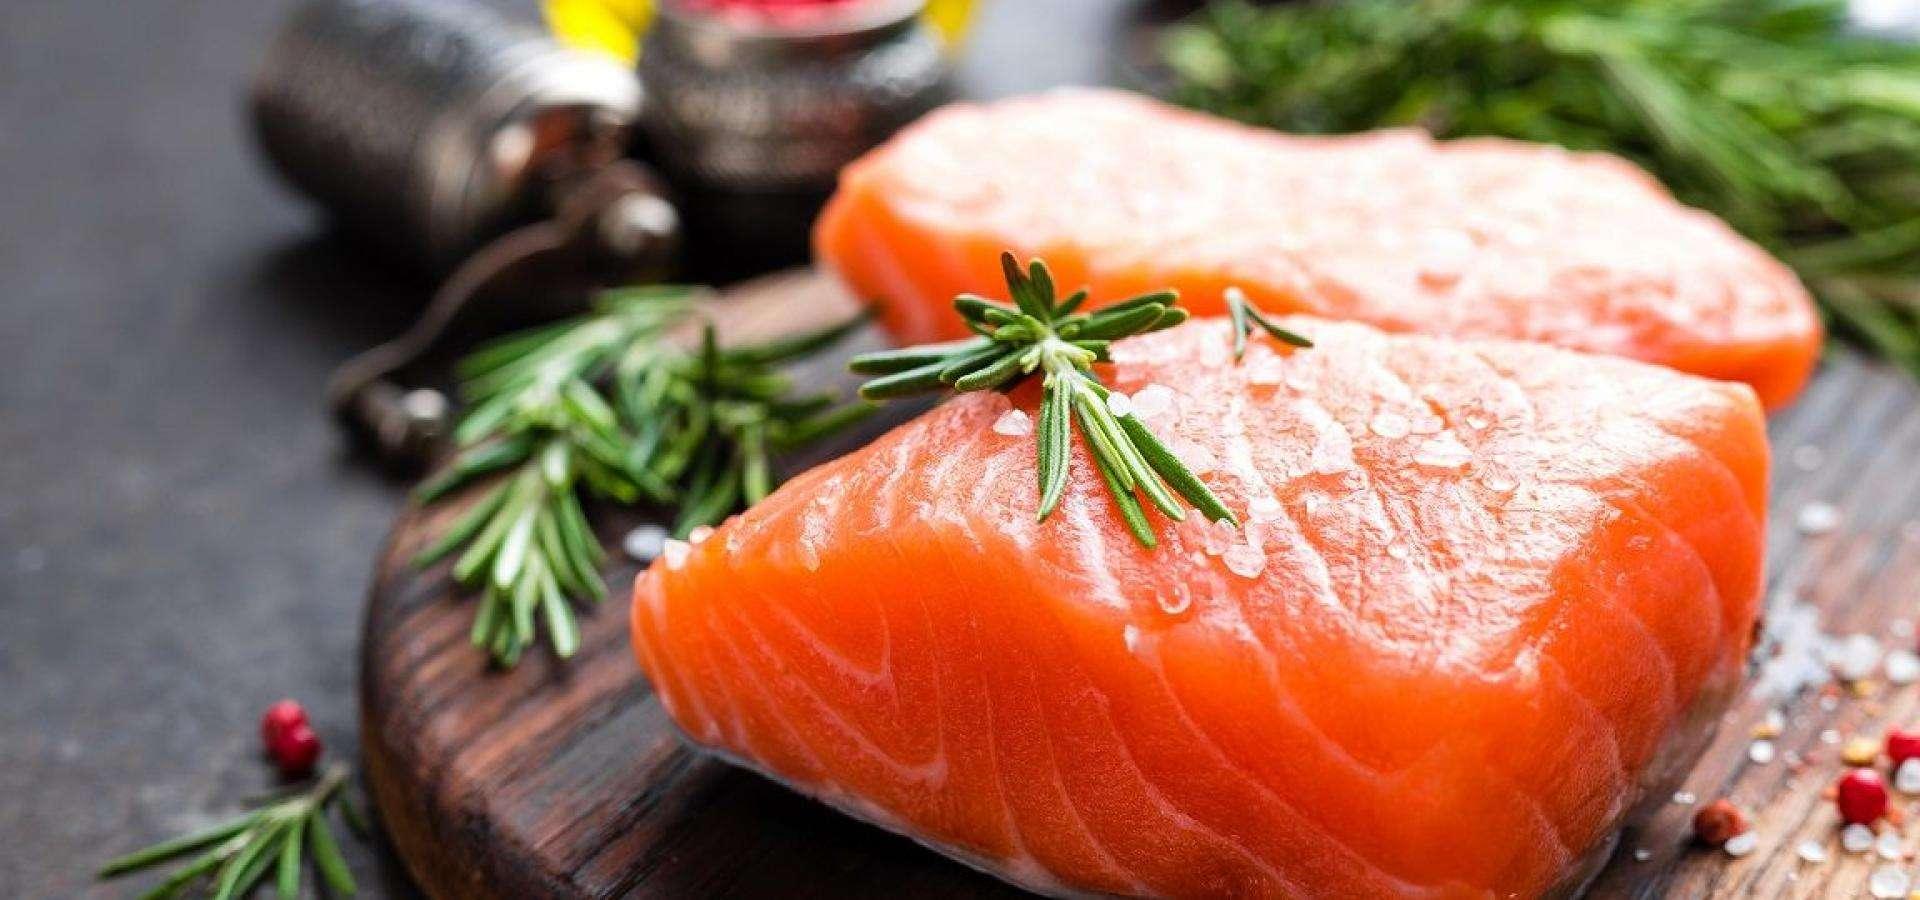 Paprika cured salmon recipe